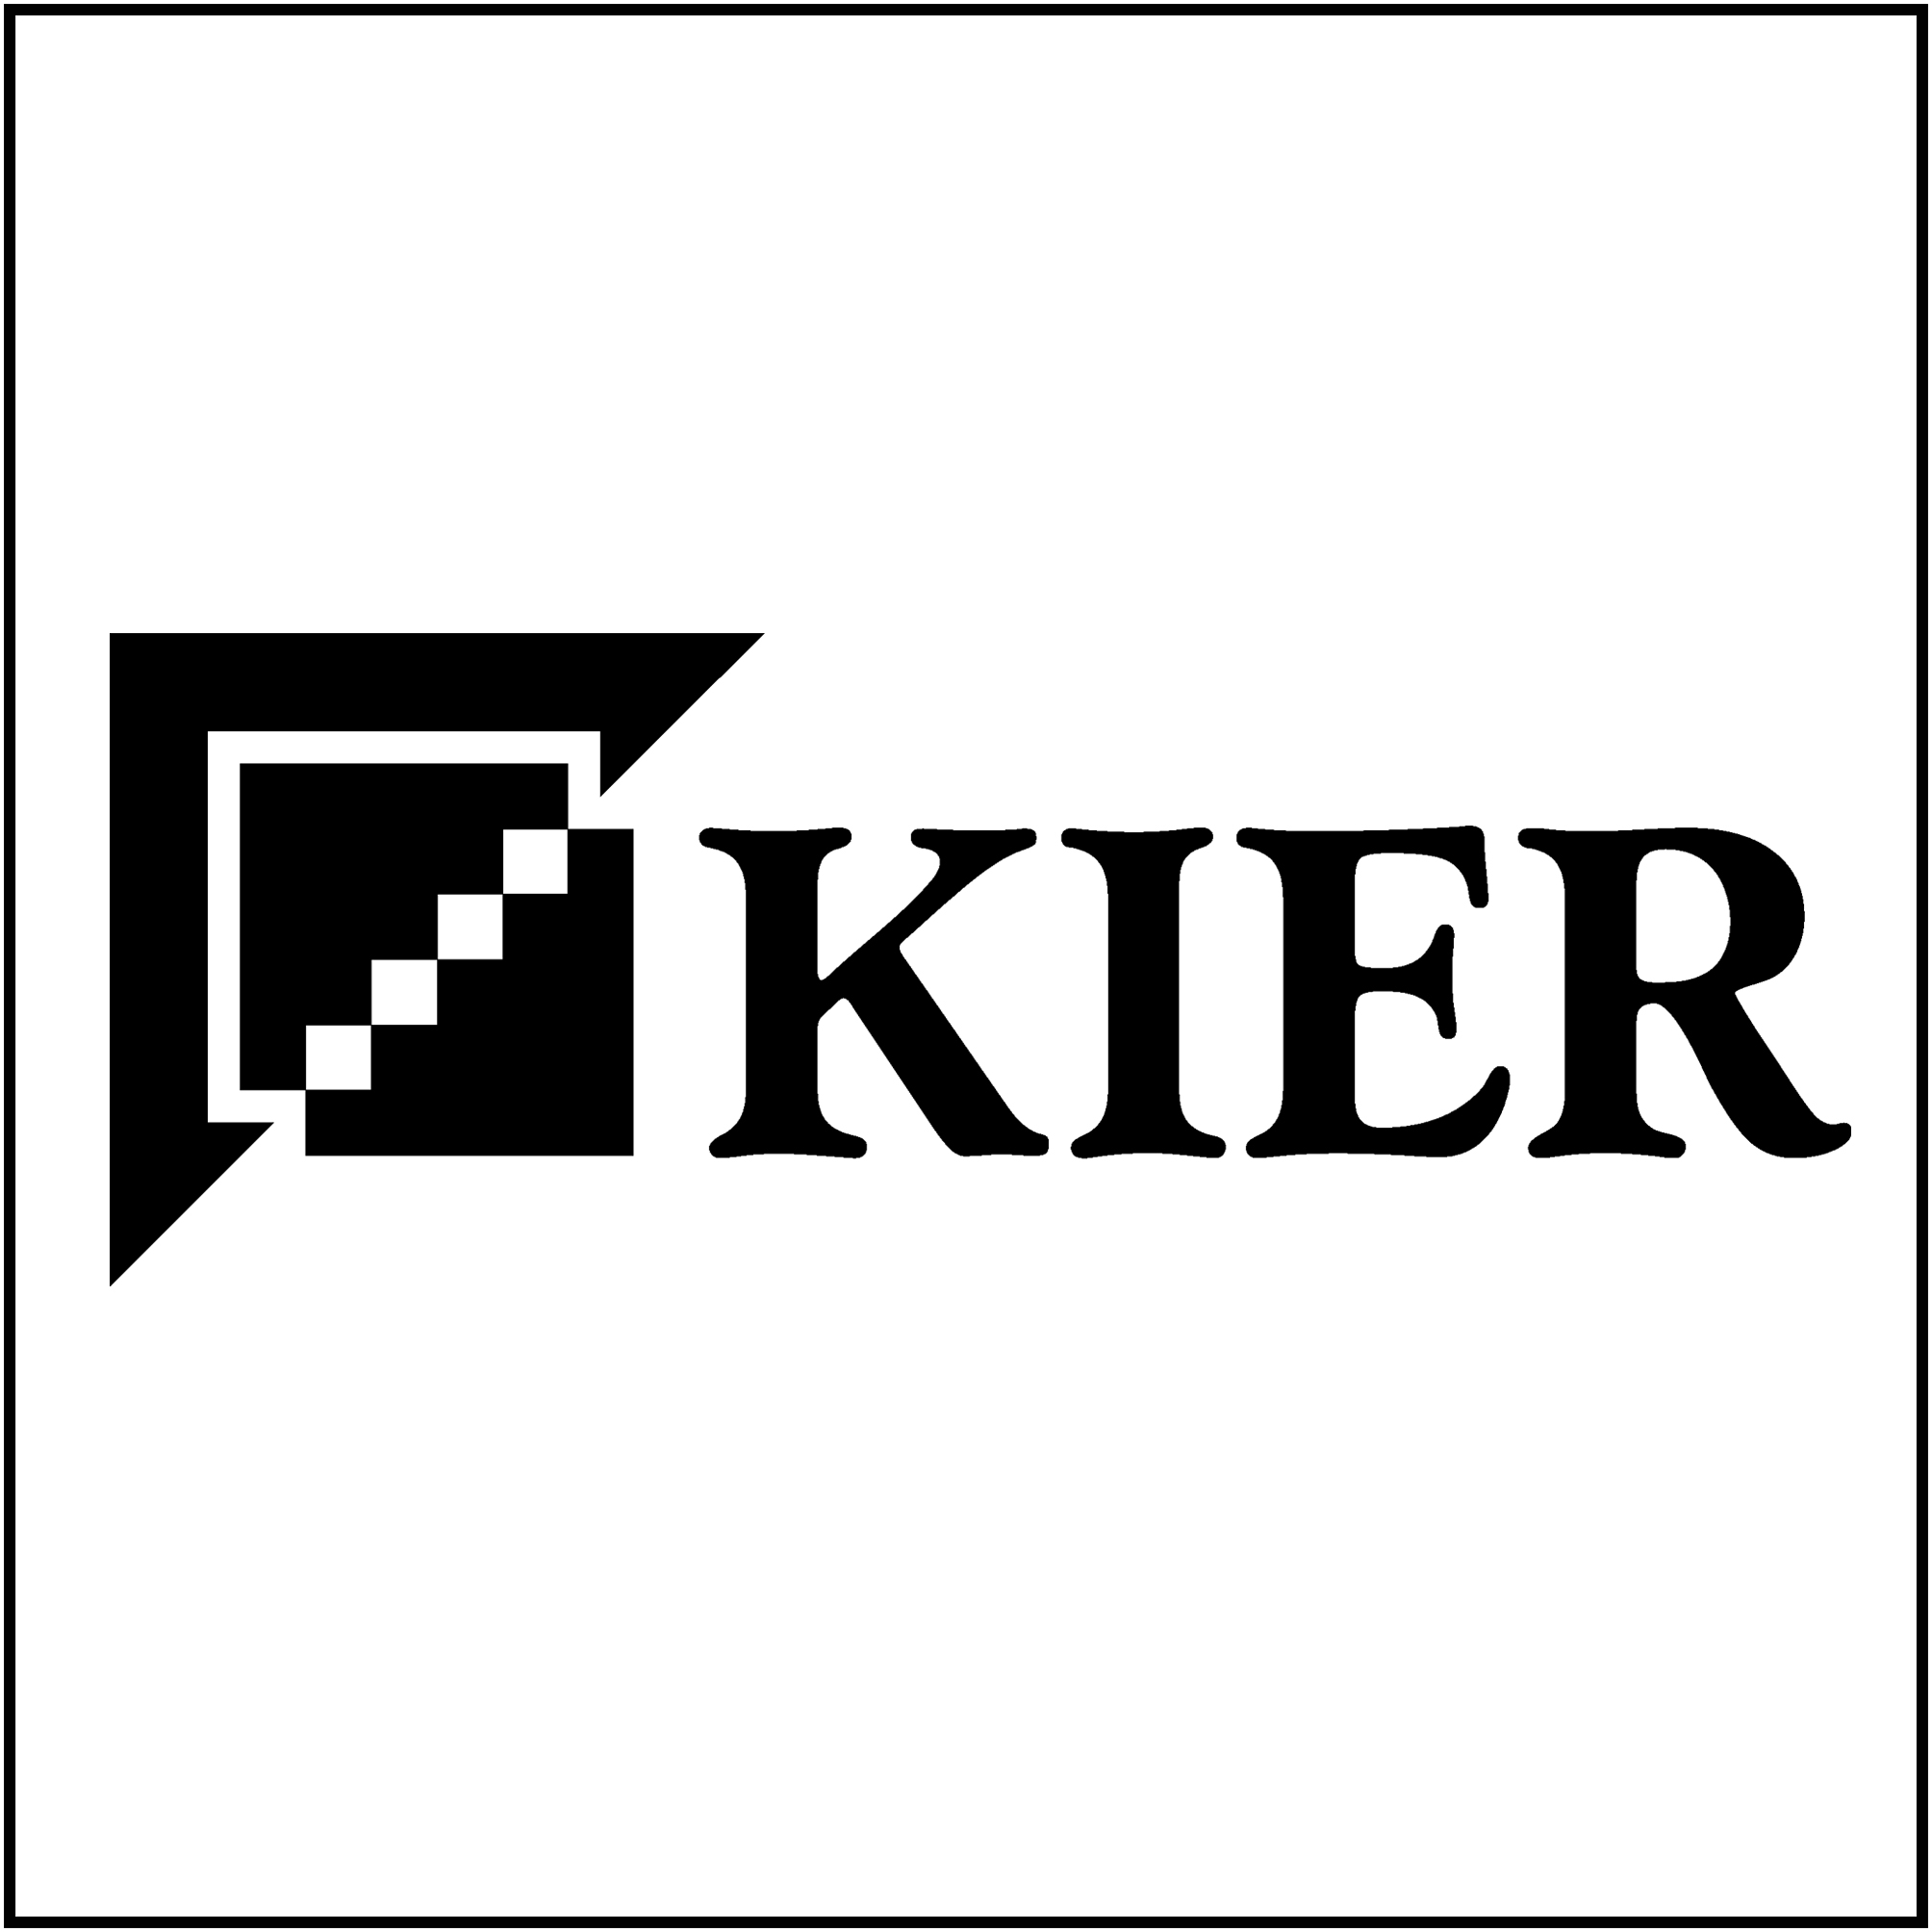 Keir logo